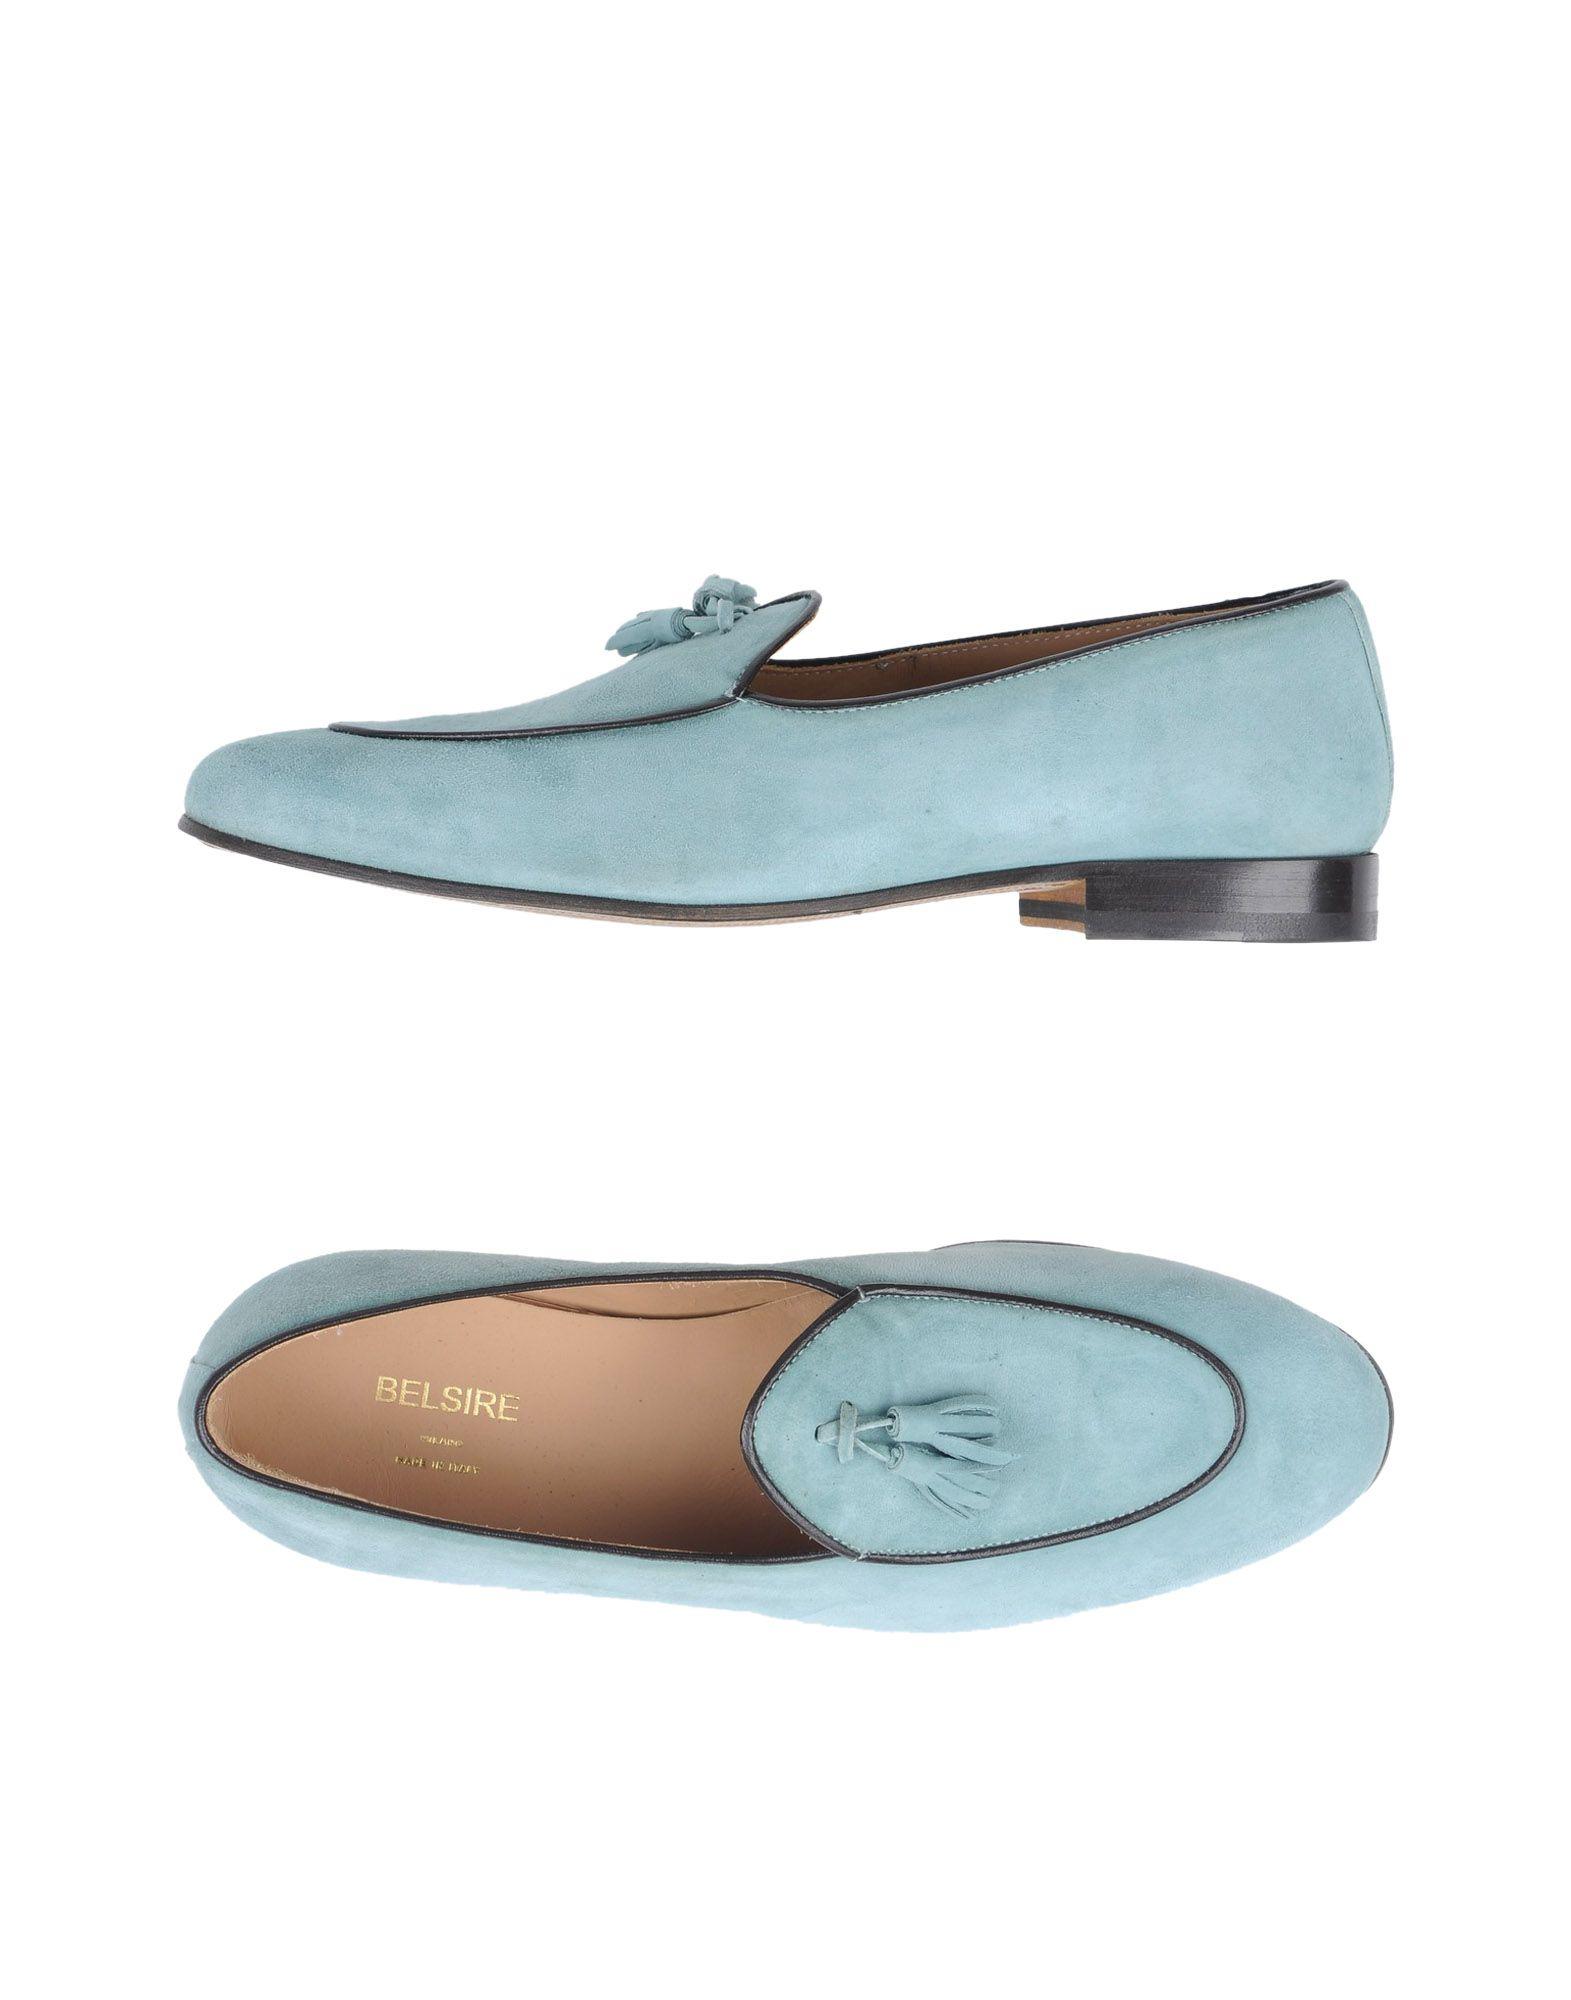 Belsire Mokassins Herren  11338736TQ Heiße Schuhe